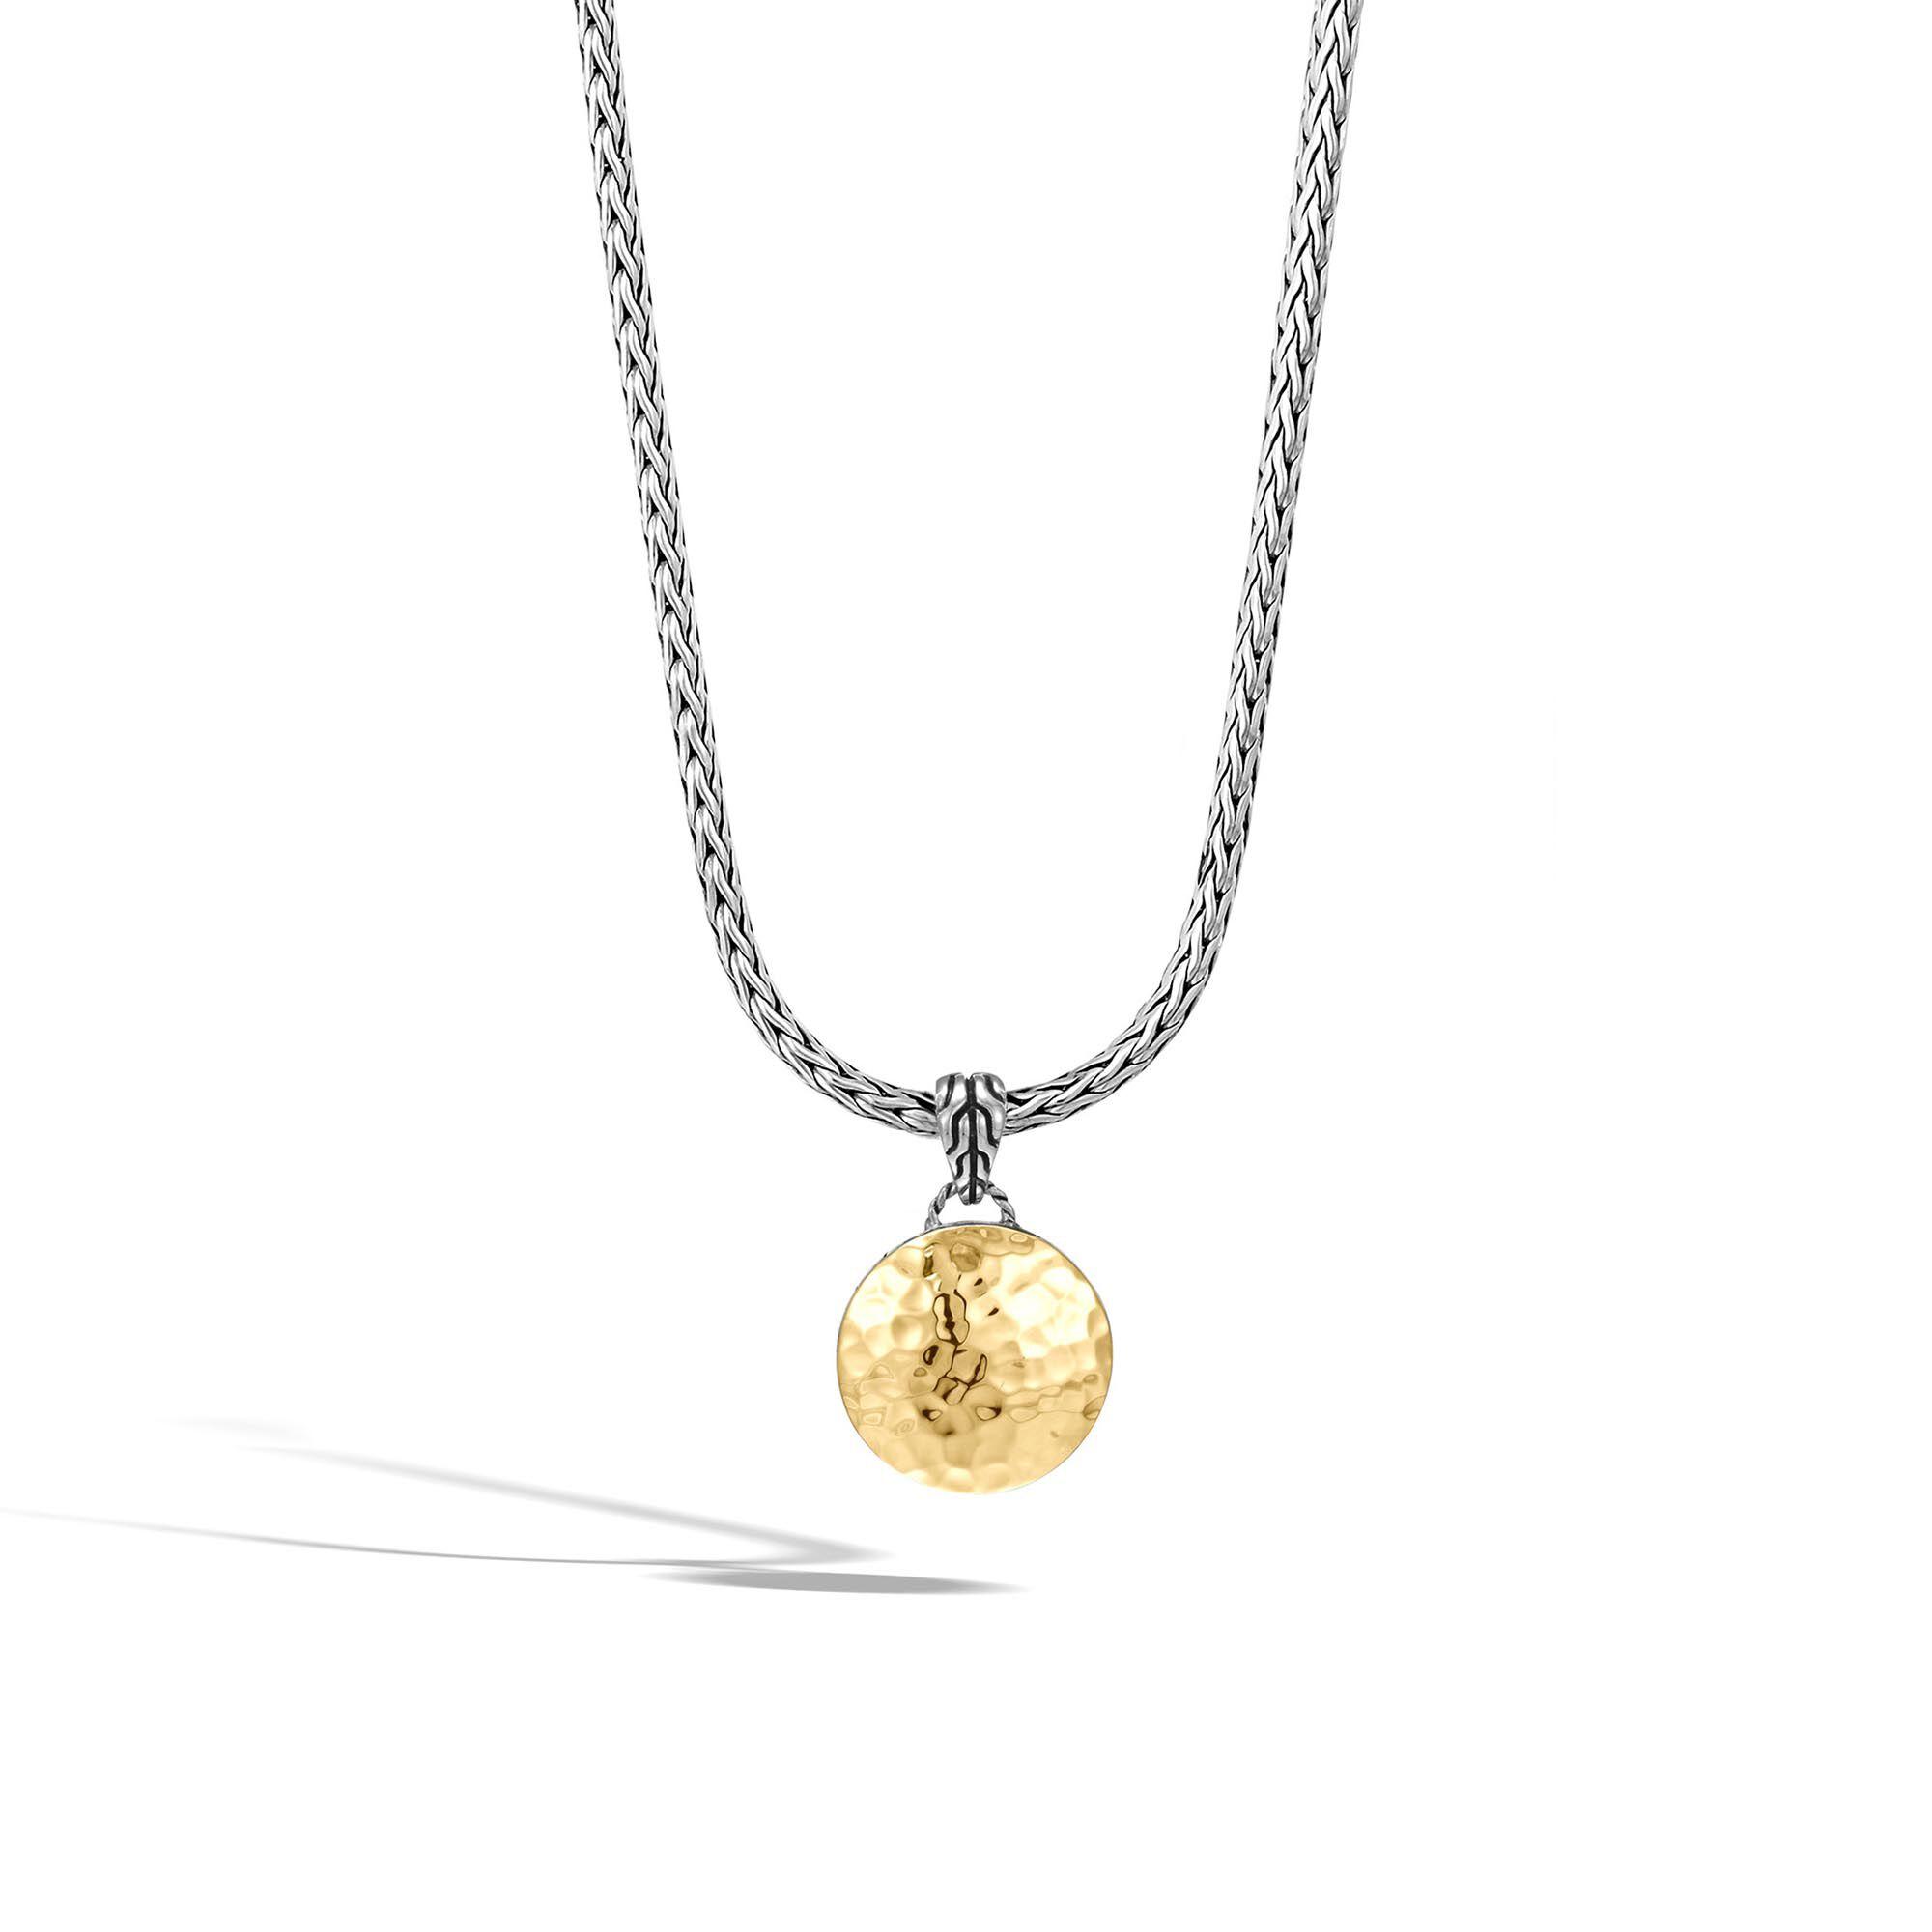 John Hardy Hammered Reversible Pendant Necklace pLXx6AN